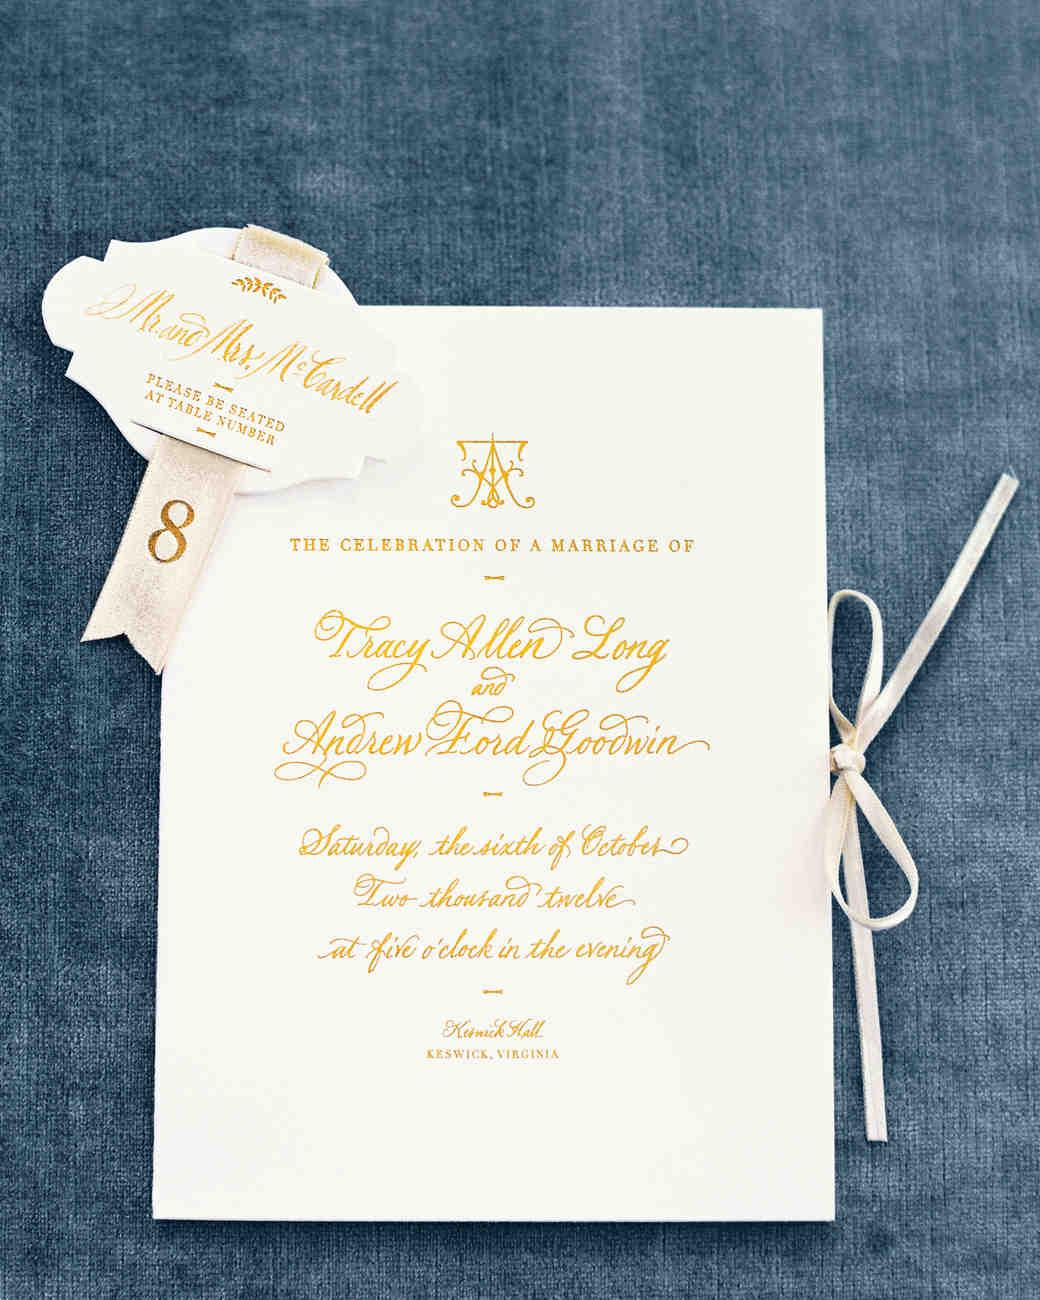 invitation-004184-r-1-003-mwds110148.jpg